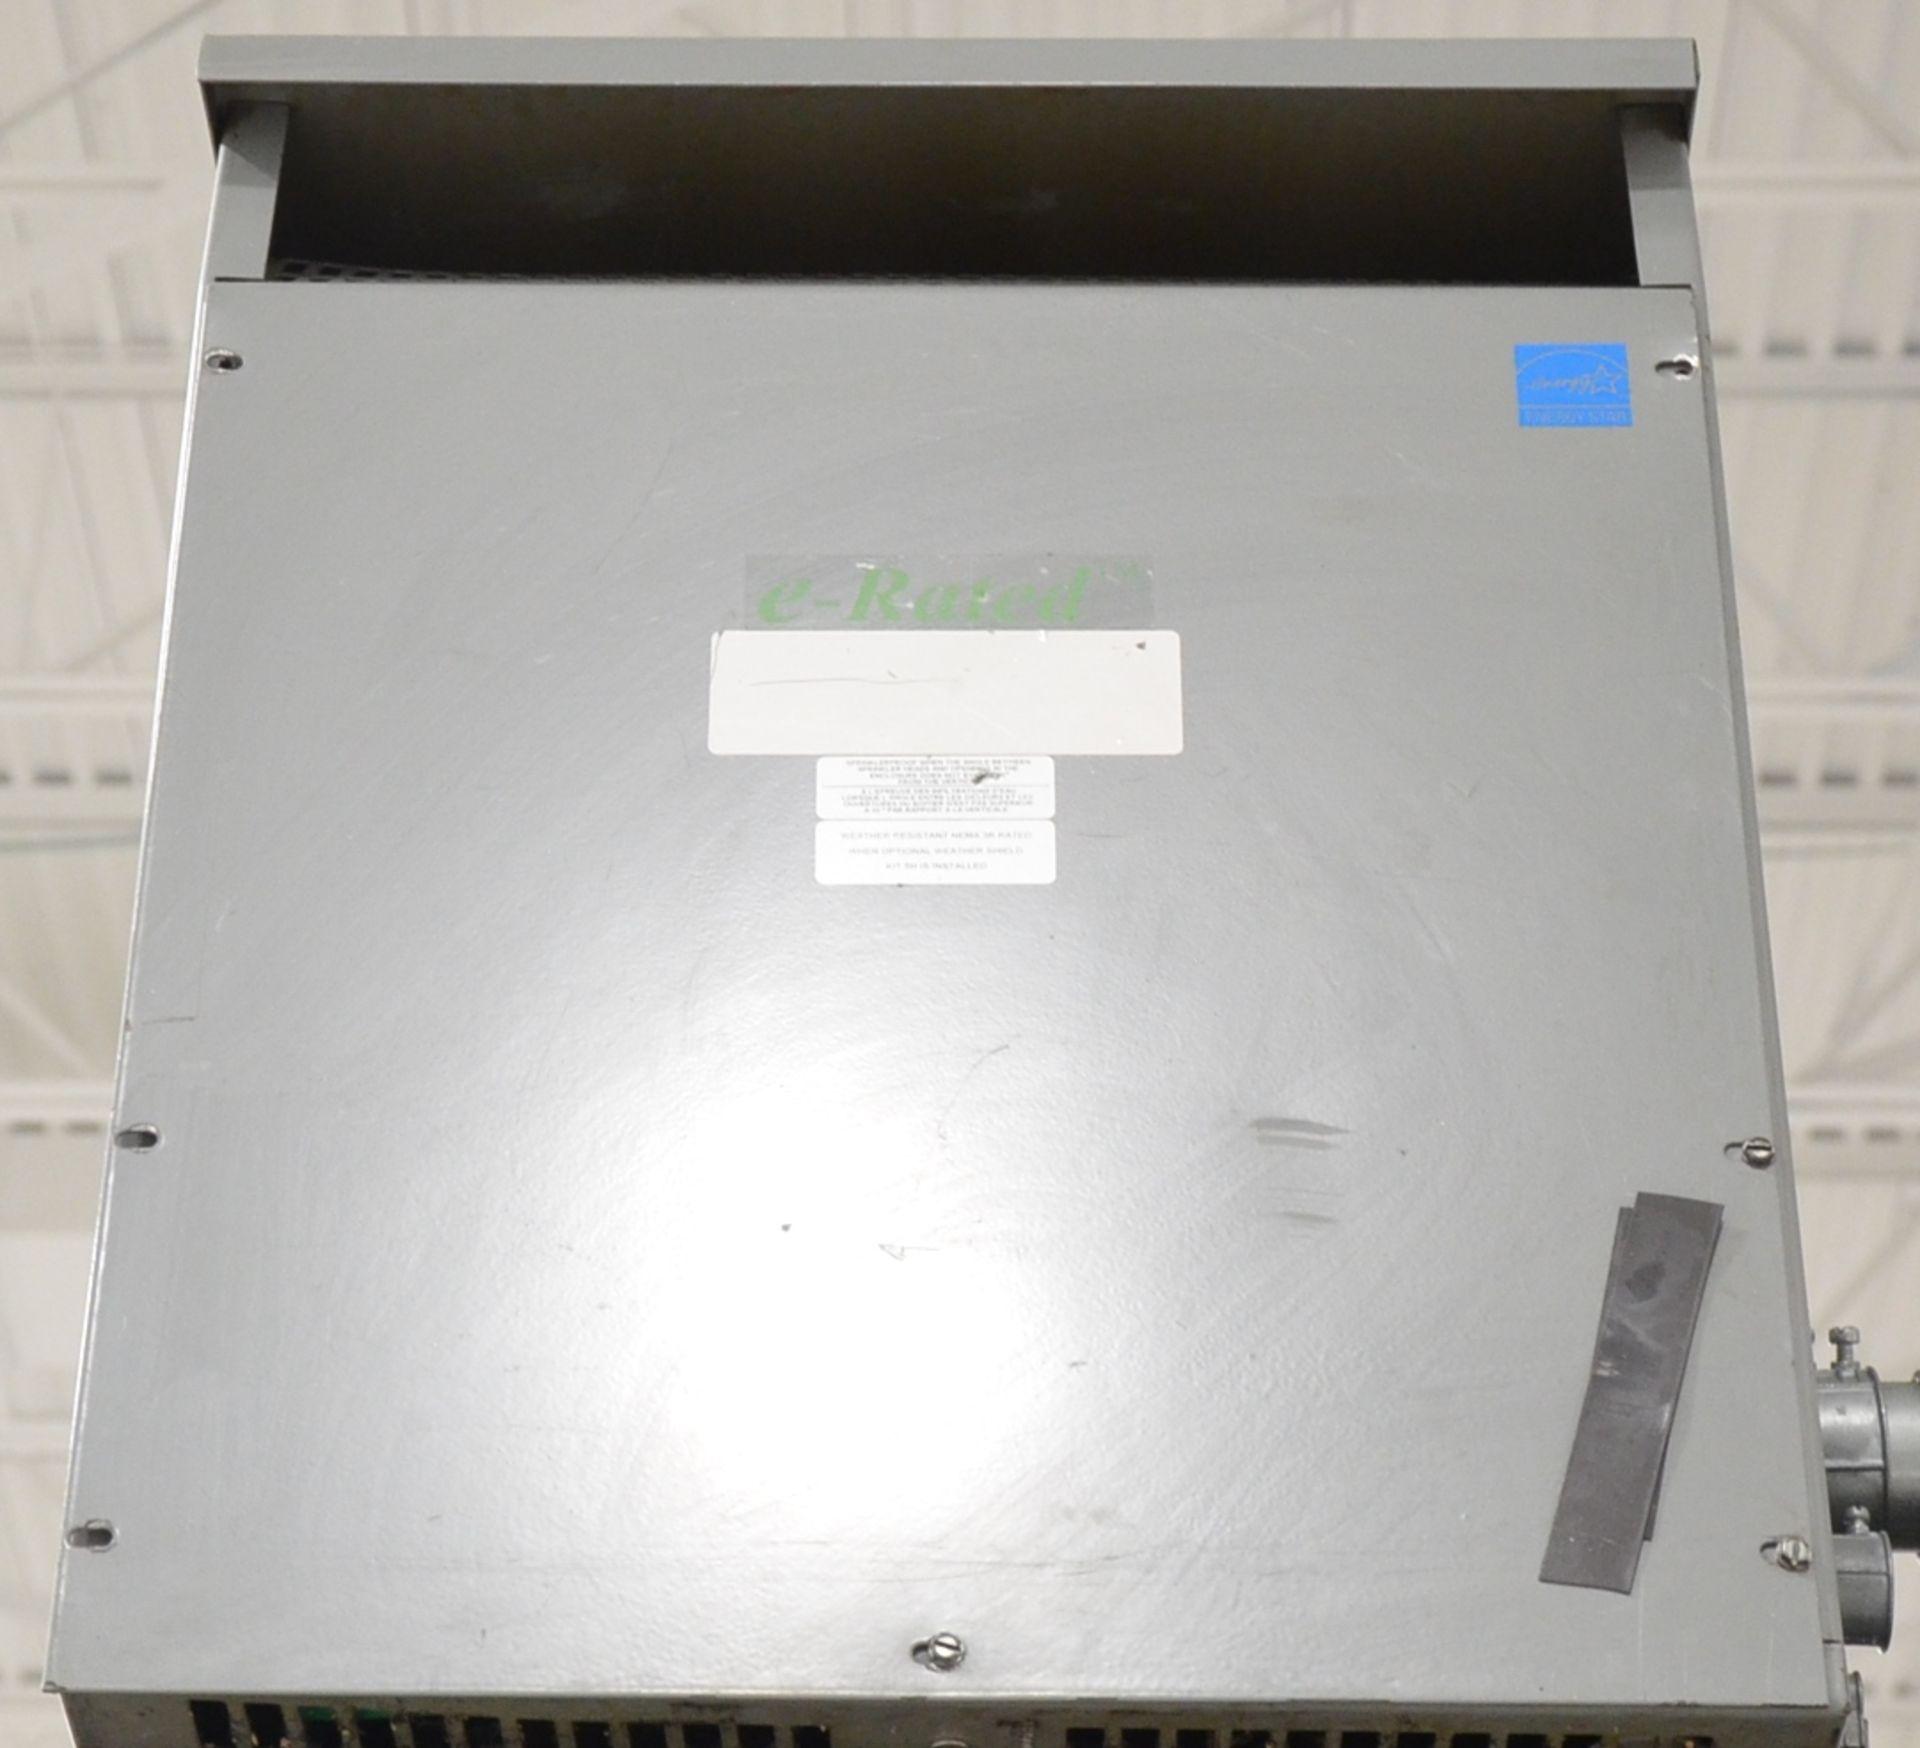 REX 45KVA/600-208-120V/3PH/60HZ TRANSFORMER (CI) [RIGGING FEES FOR LOT #420 - $50 USD PLUS